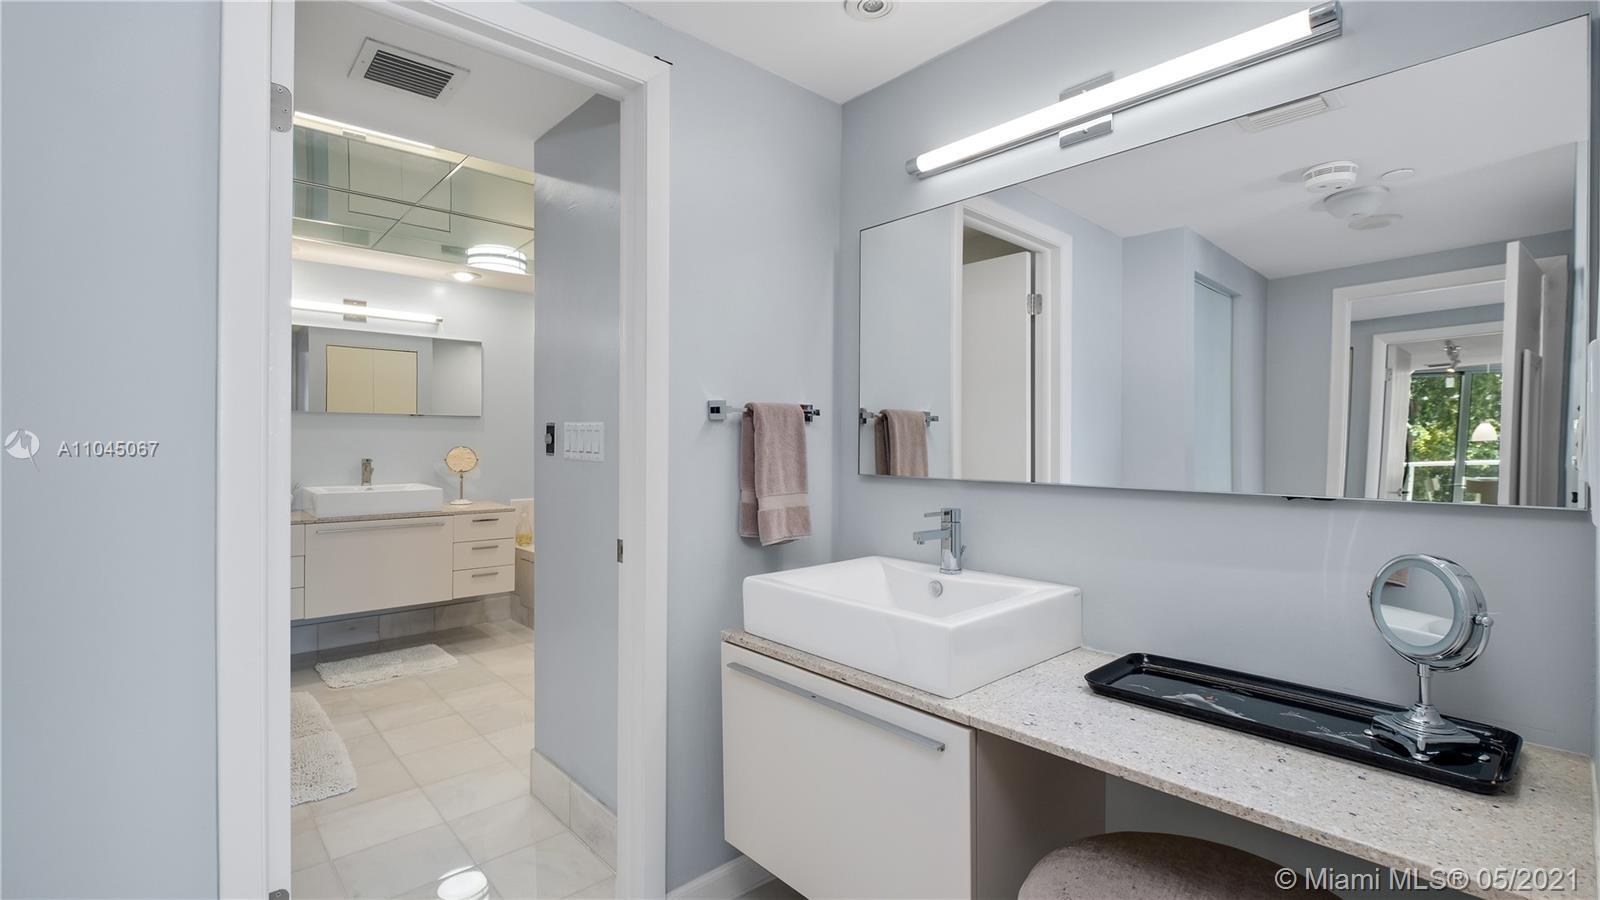 Photo of 20281 Country Club Dr #314, Aventura, Florida, 33180 - Principal Bedroom